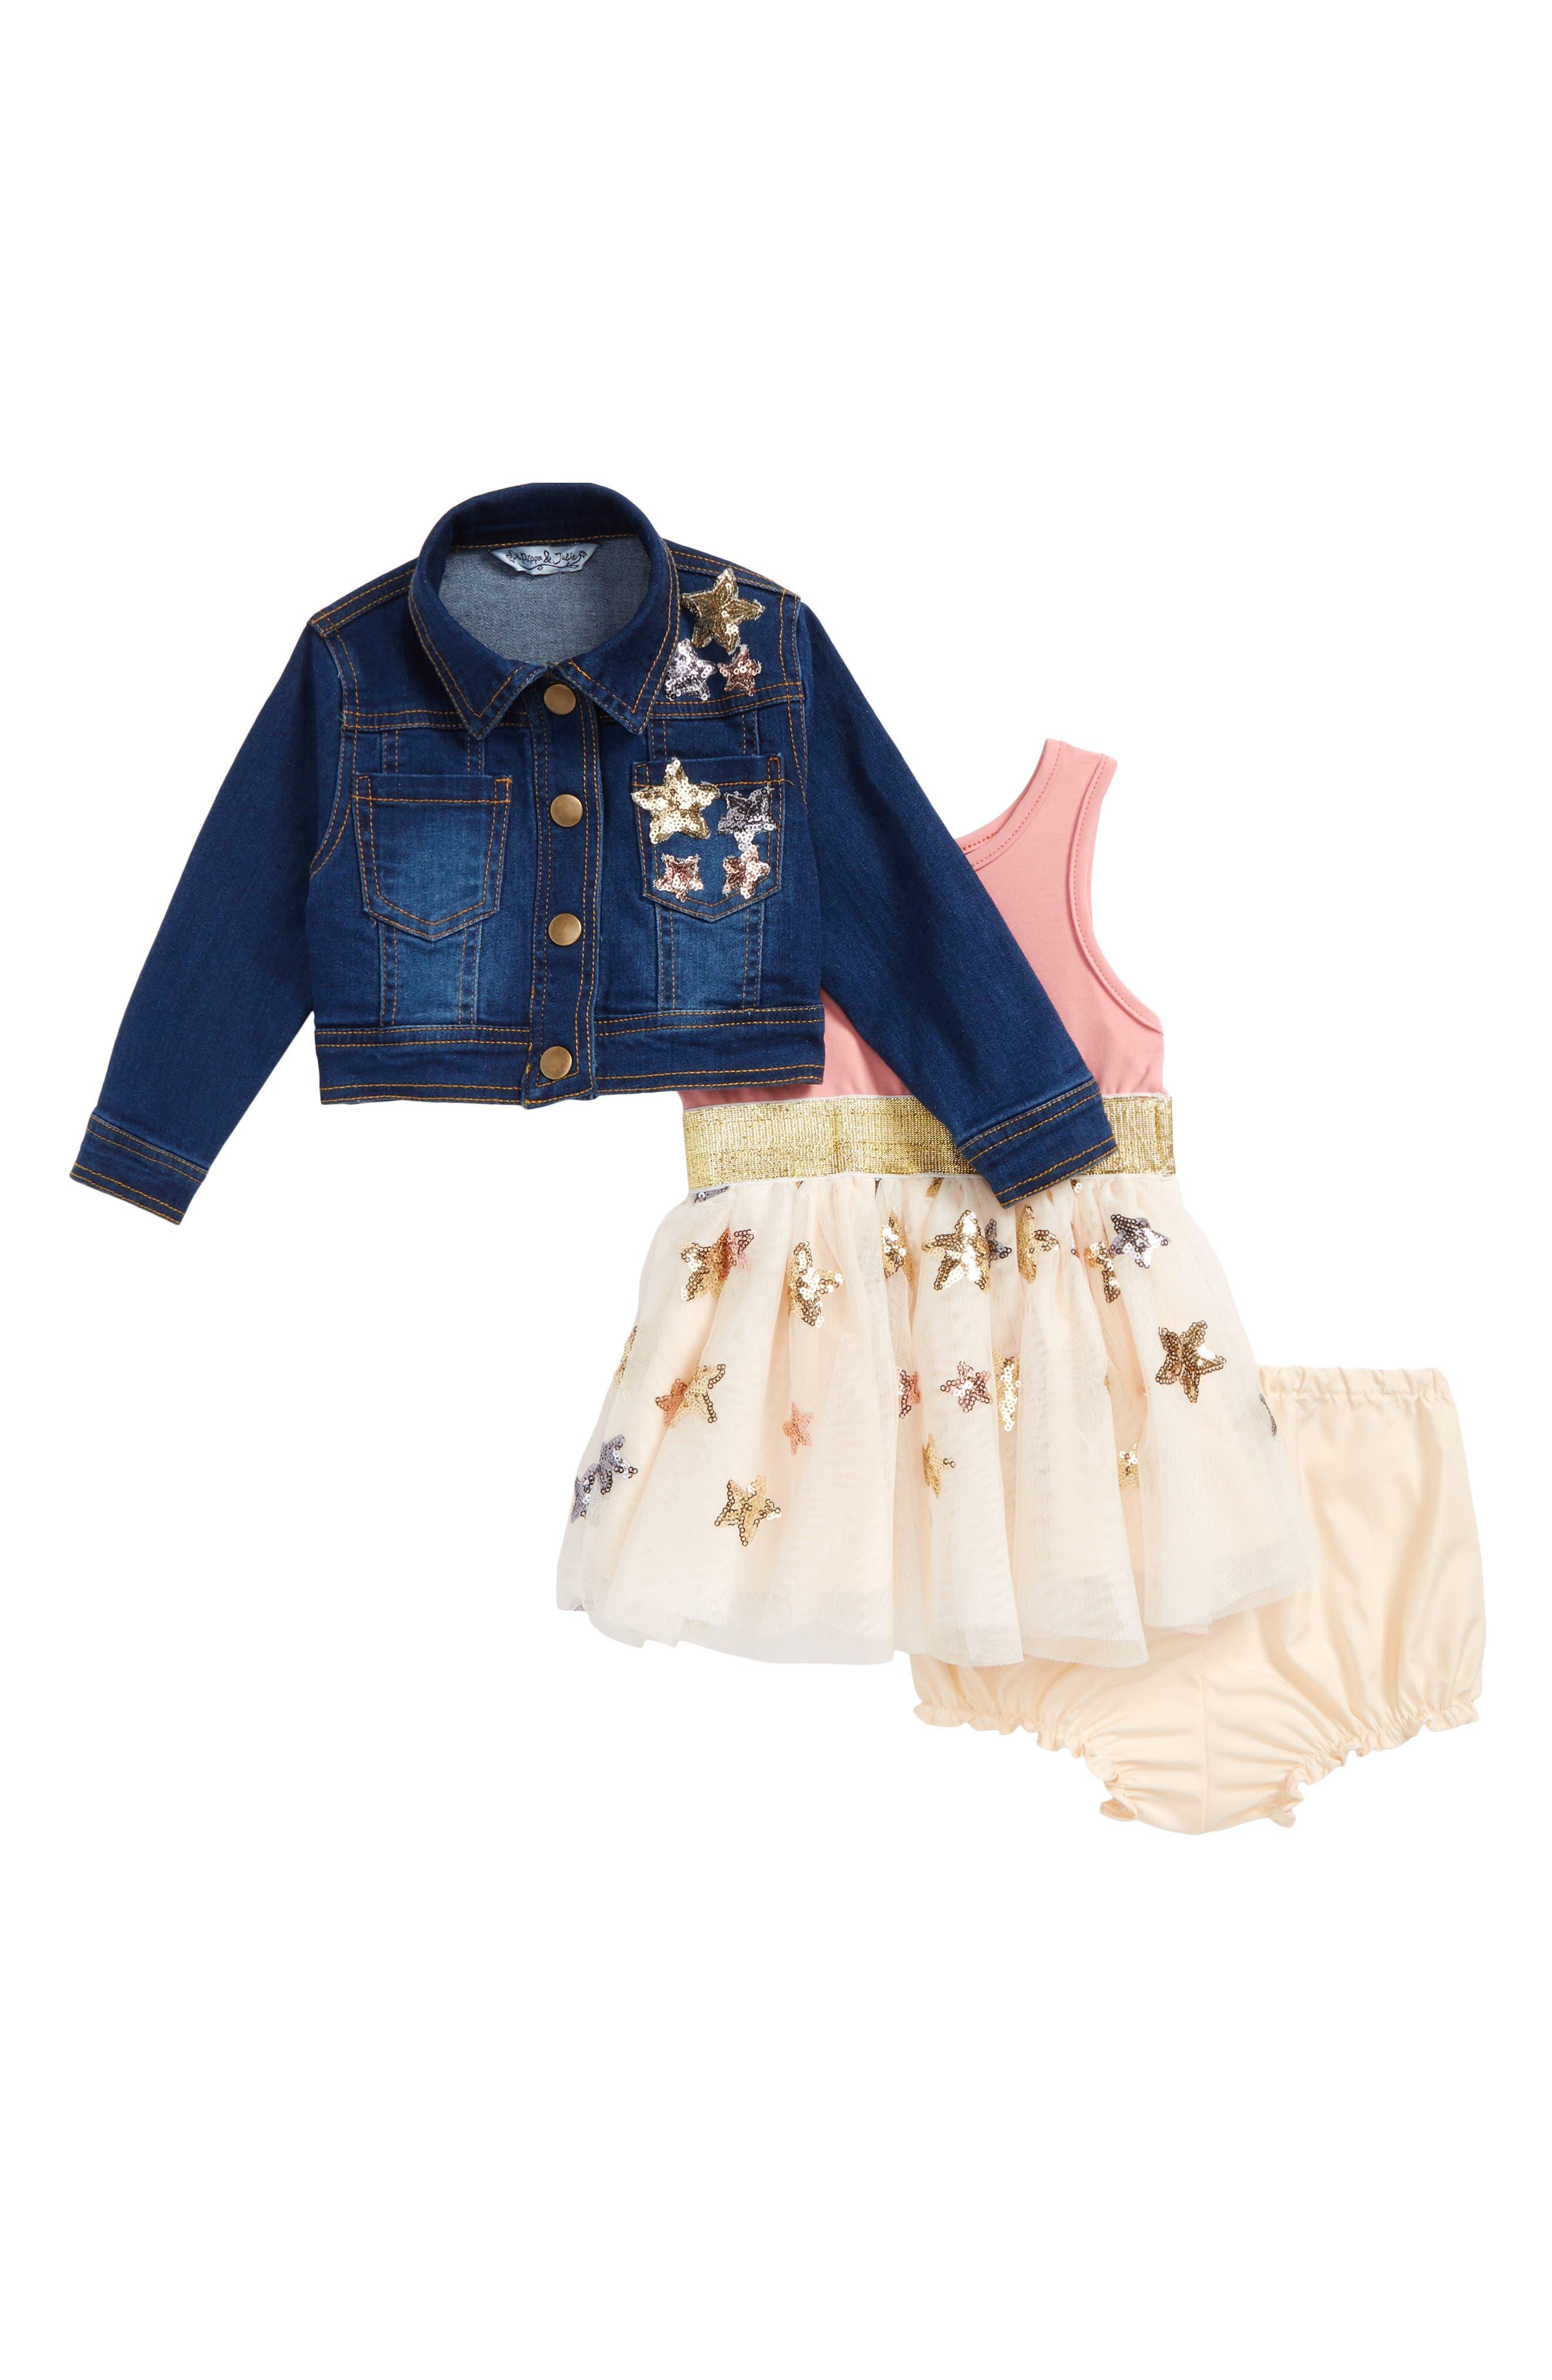 Sequin Star Tank Dress & Denim Jacket Set,                             Main thumbnail 1, color,                             Denim